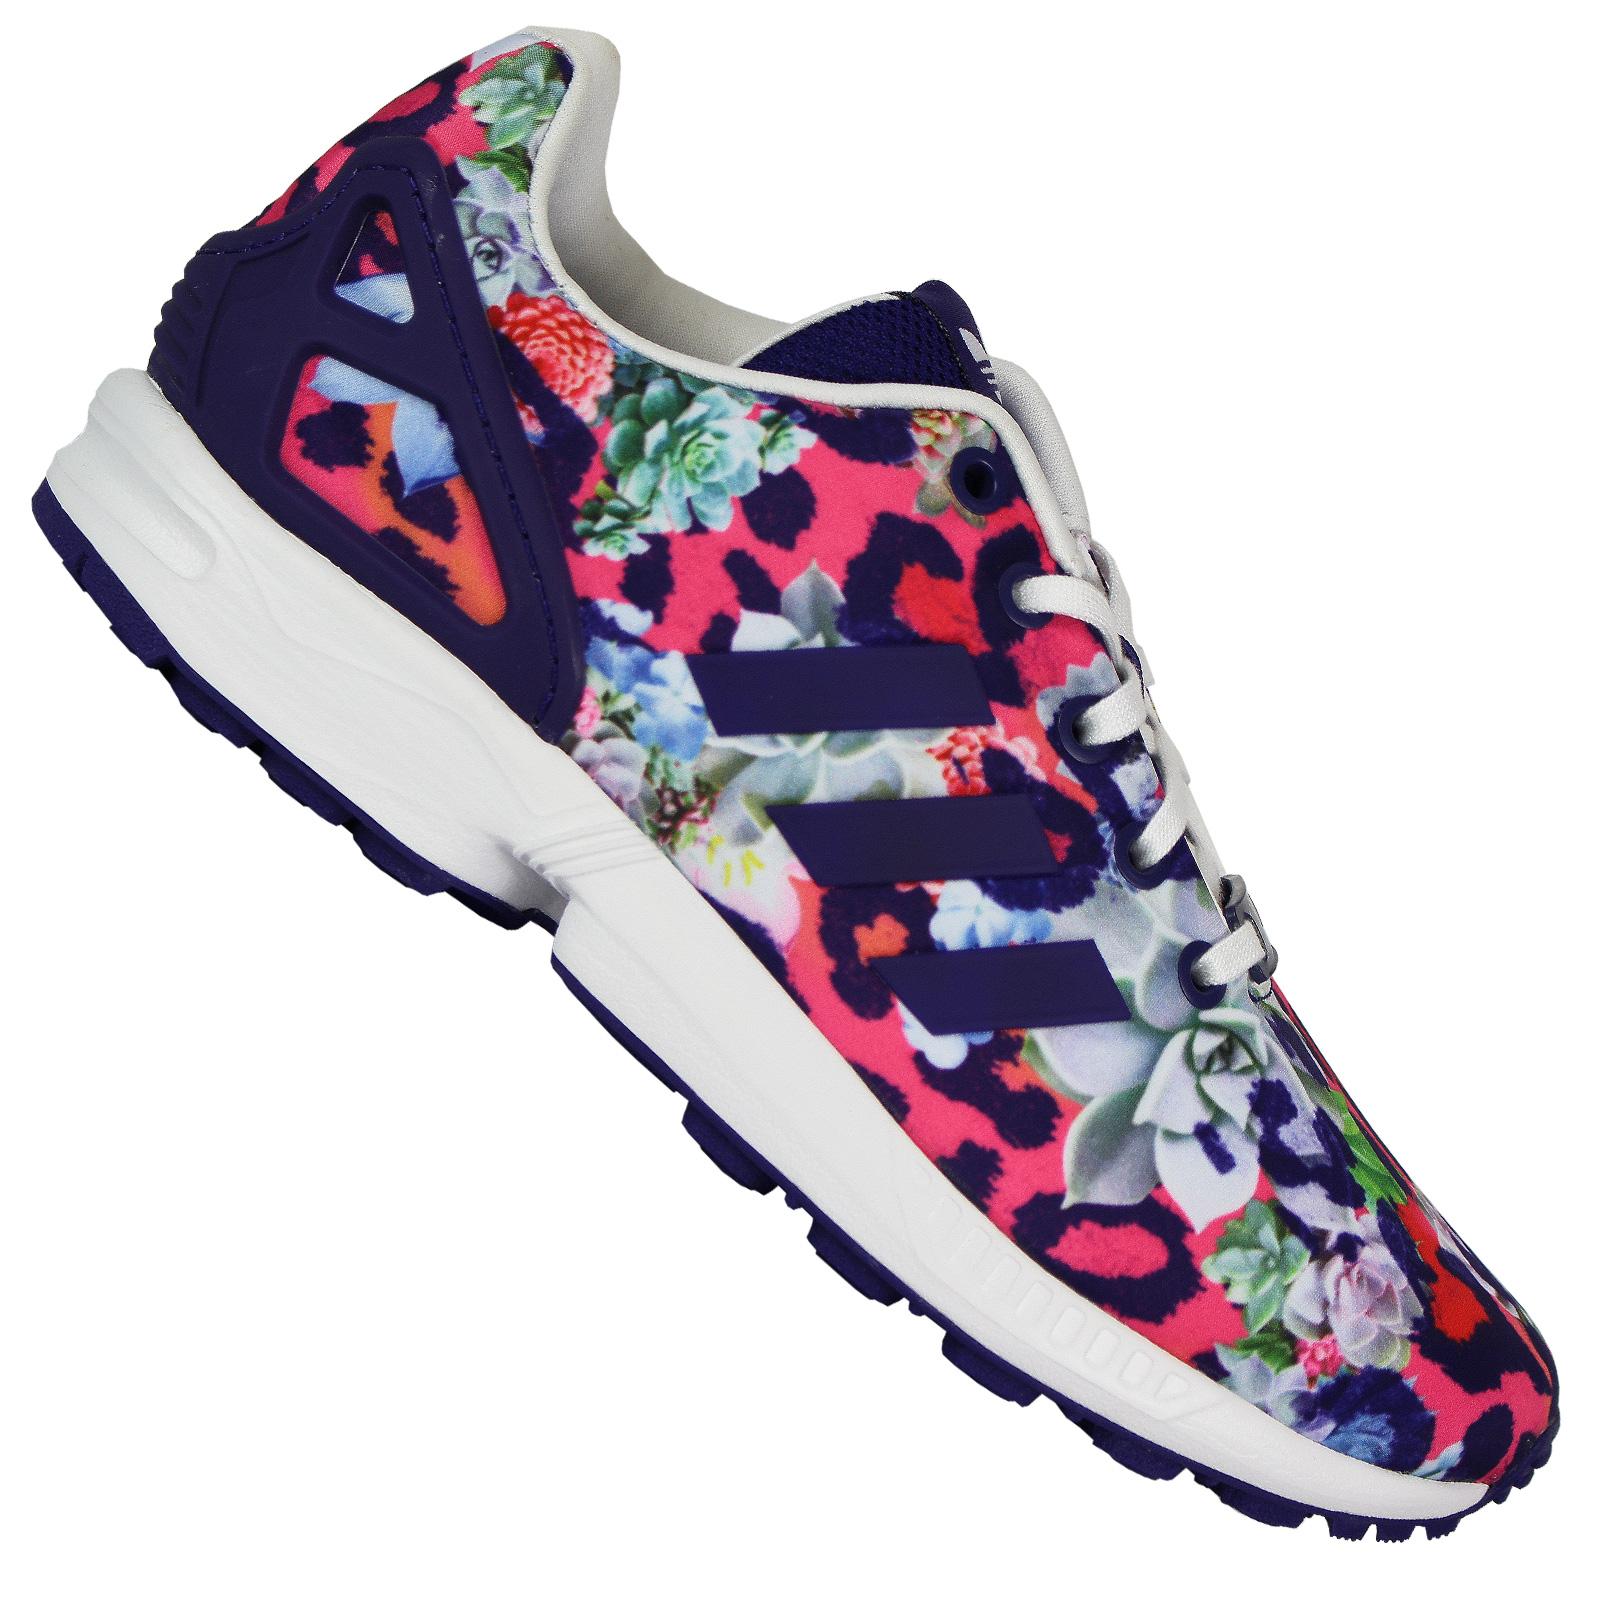 adidas damen sneakers zx flux violett